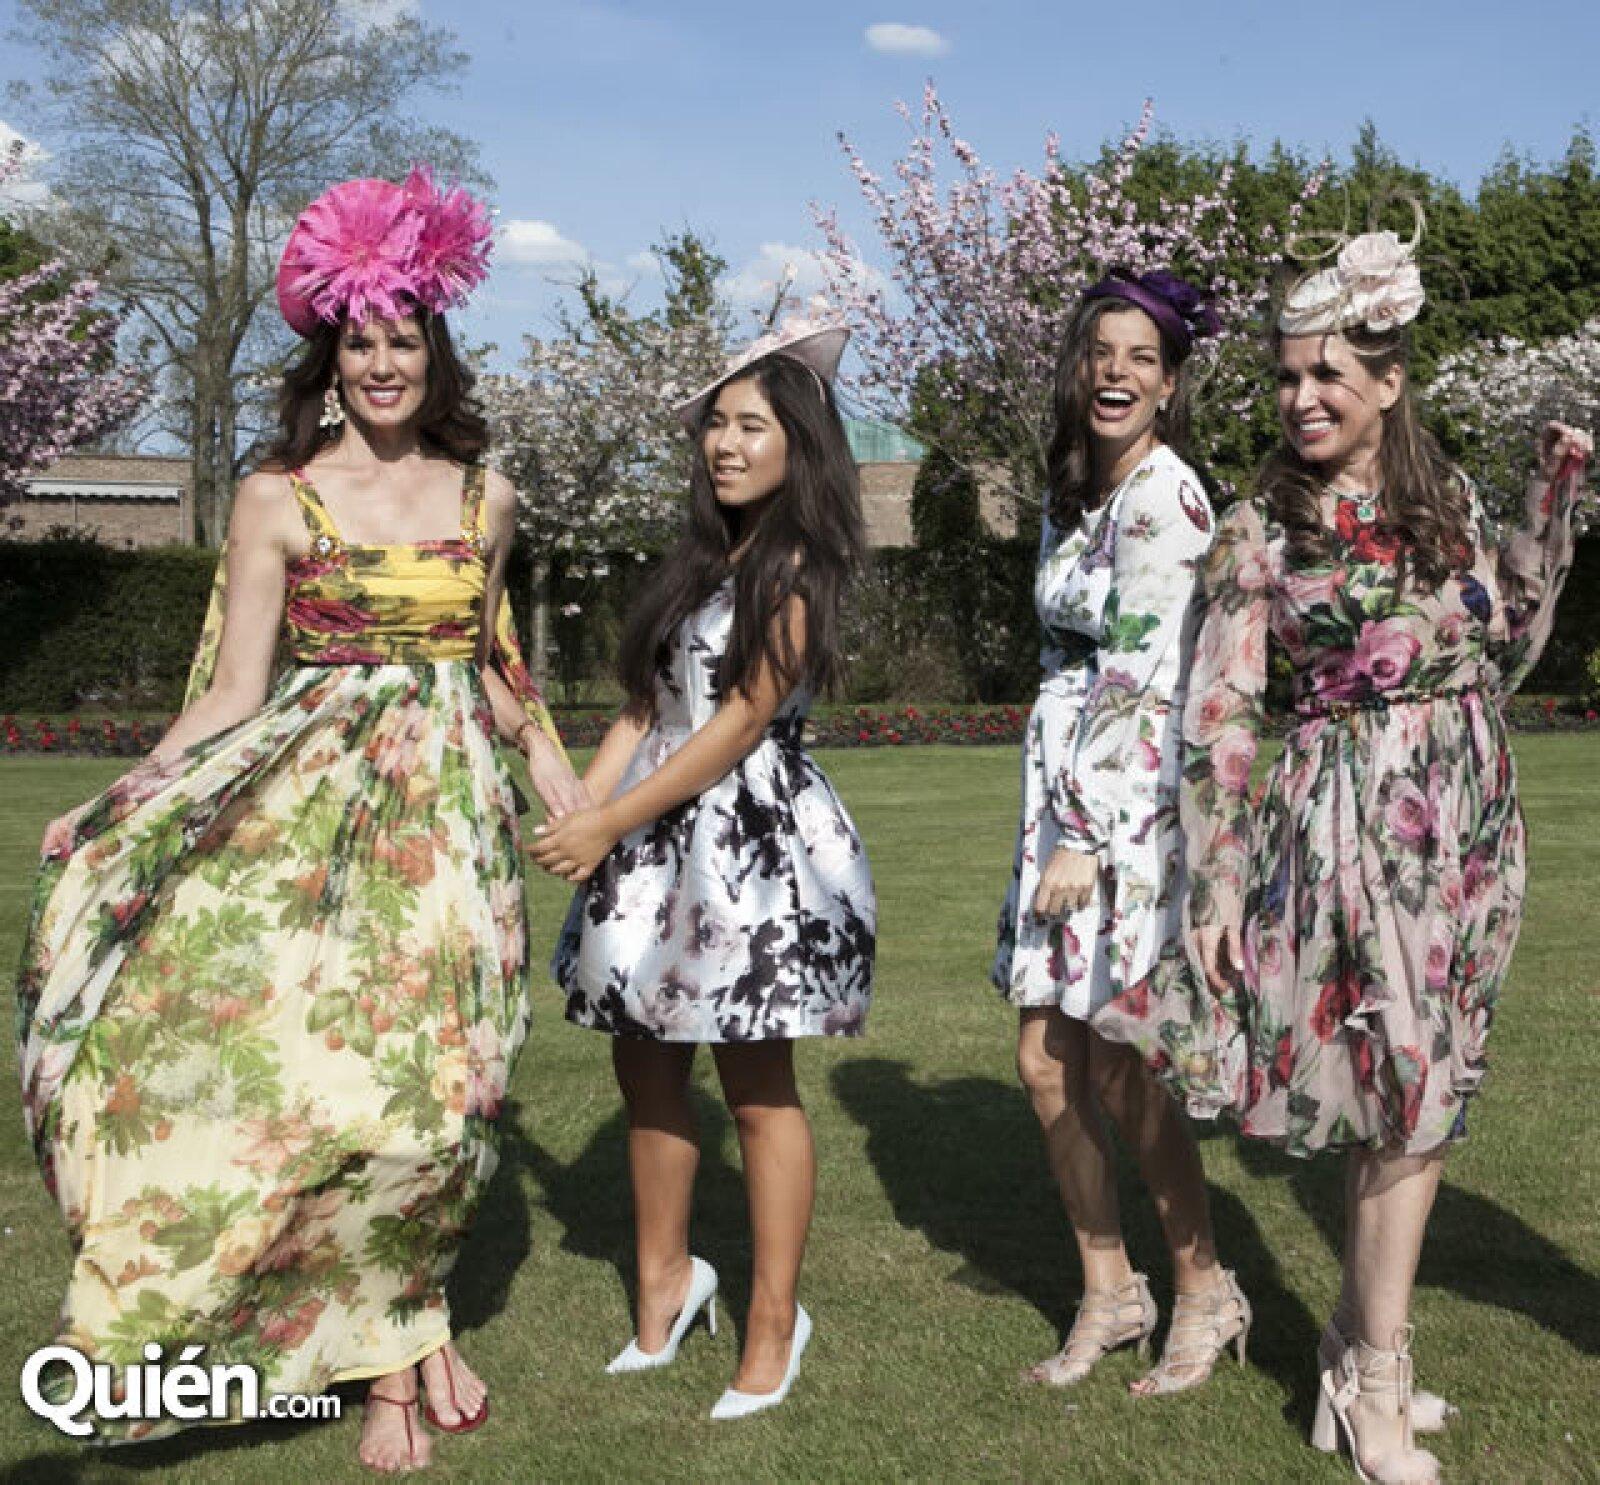 Christina Estrada, Sirina Juffali, Bárbara Coppel y Sonia Falcone